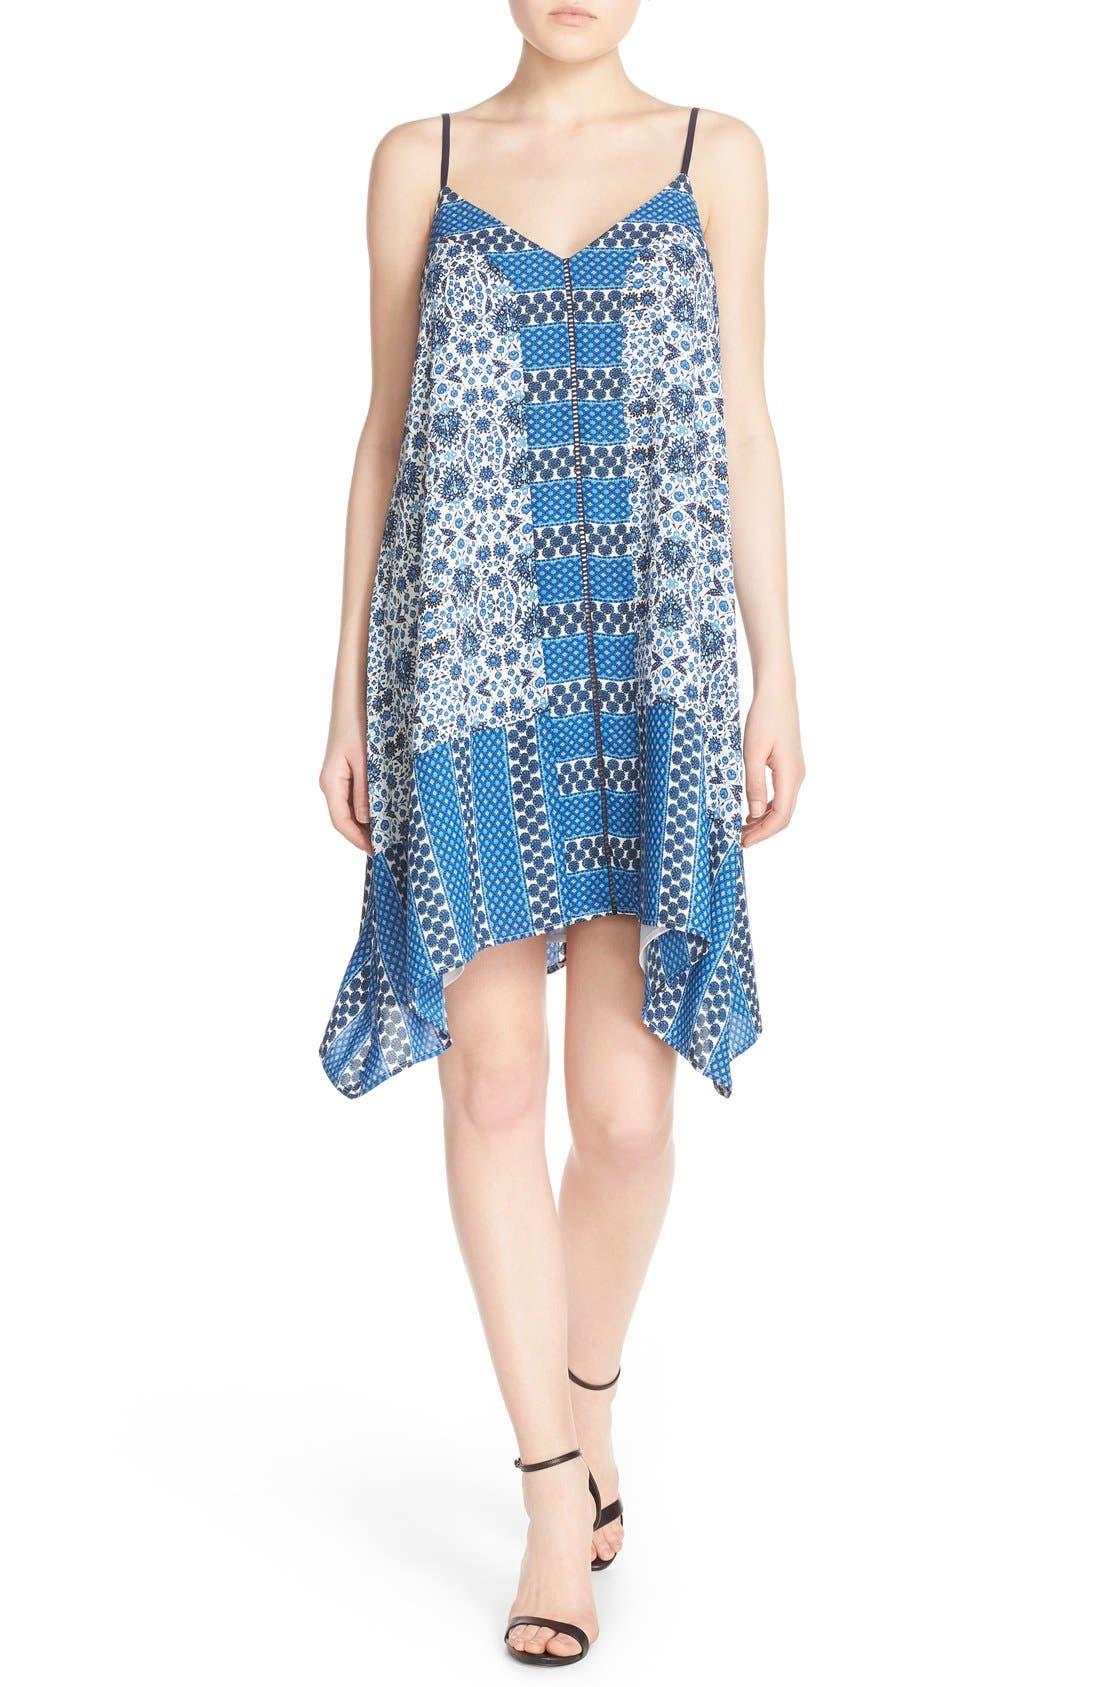 ADELYN RAE, Scarf Print Crepe Trapeze Dress, Alternate thumbnail 3, color, 400